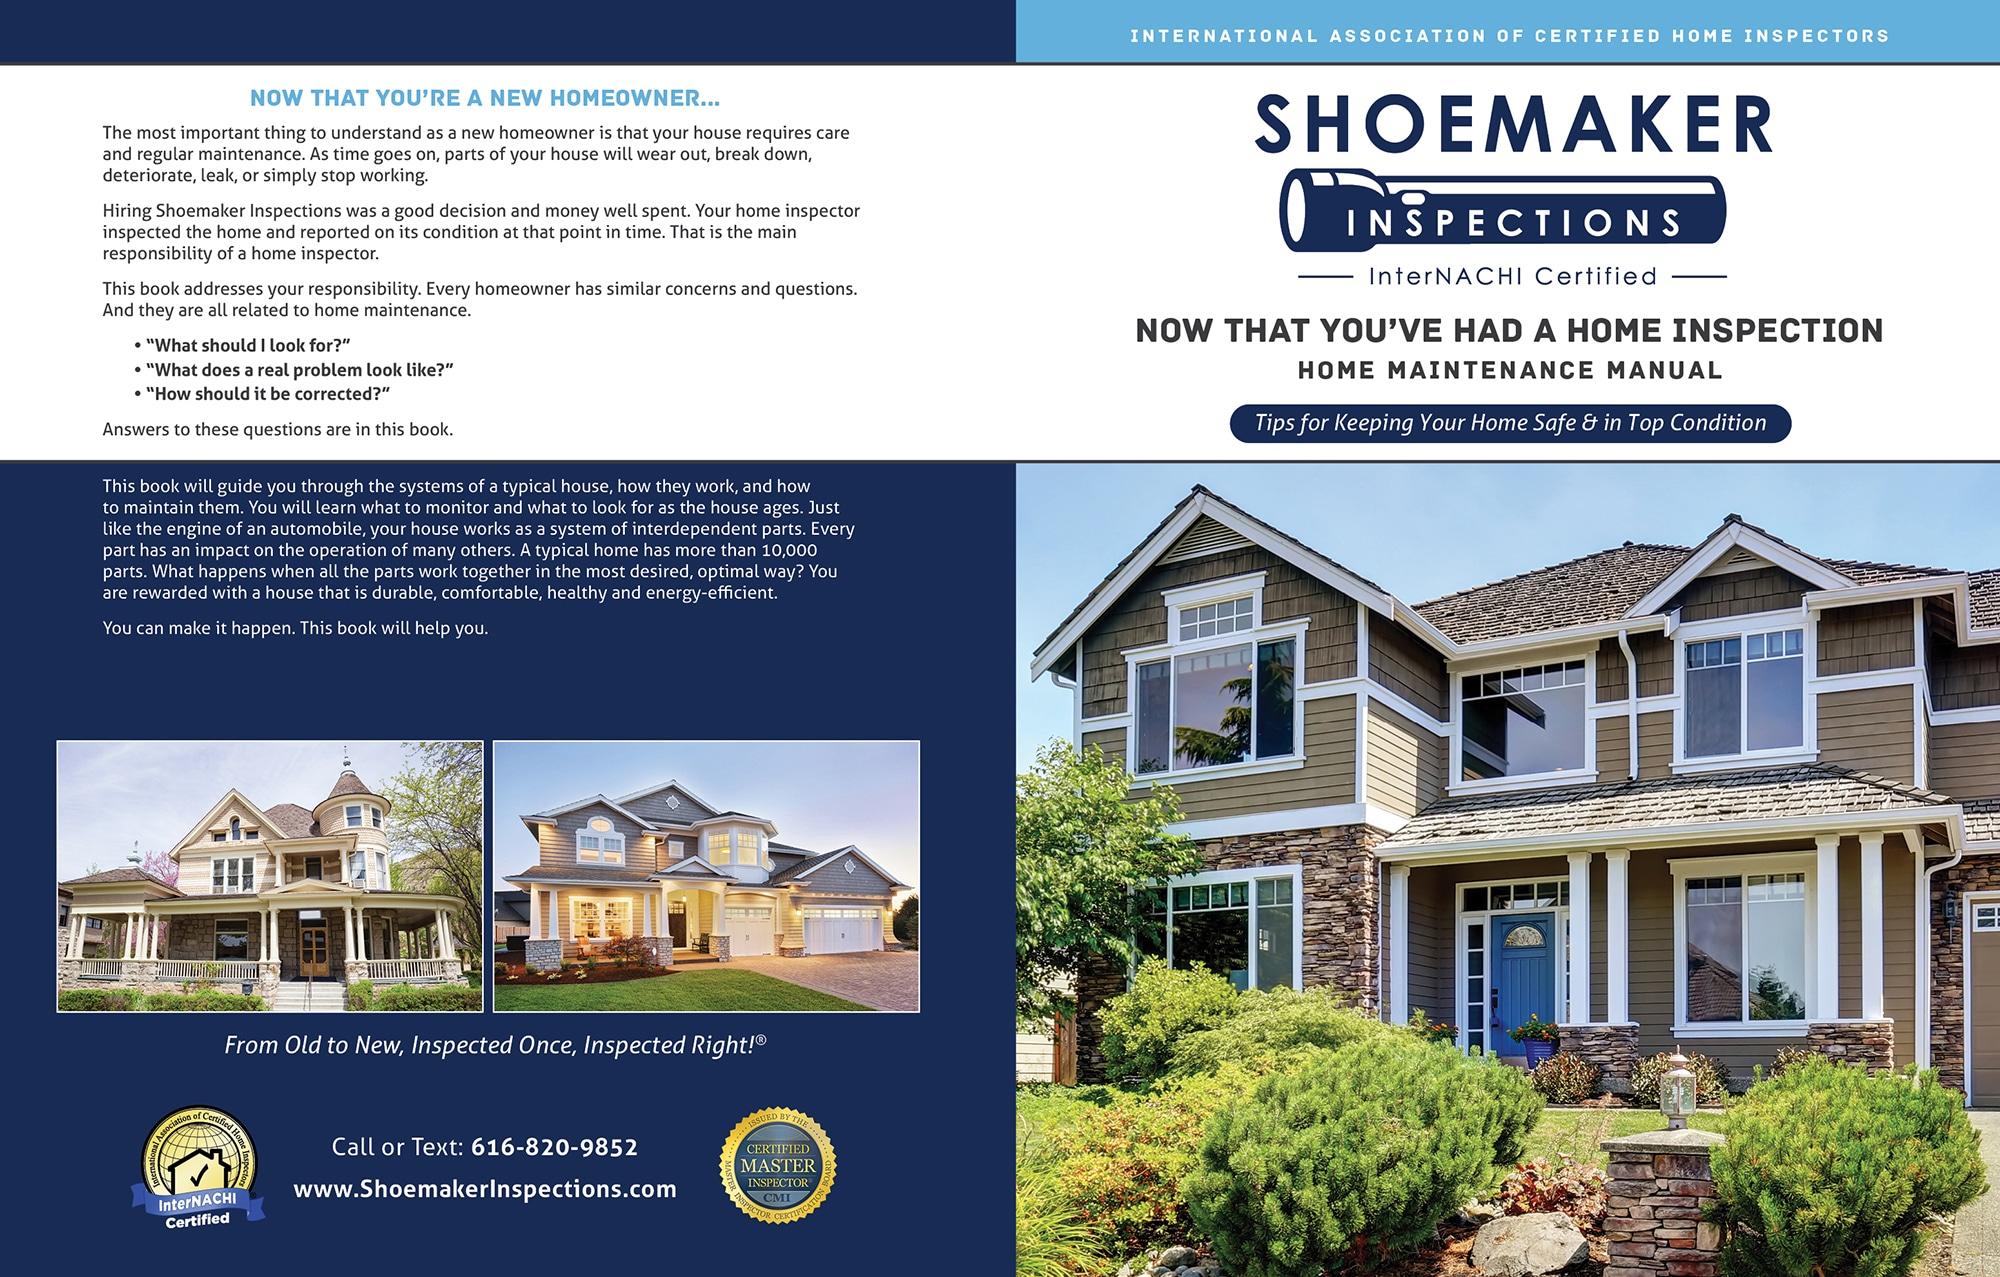 Custom Home Maintenance Book for Shoemaker Inspections.